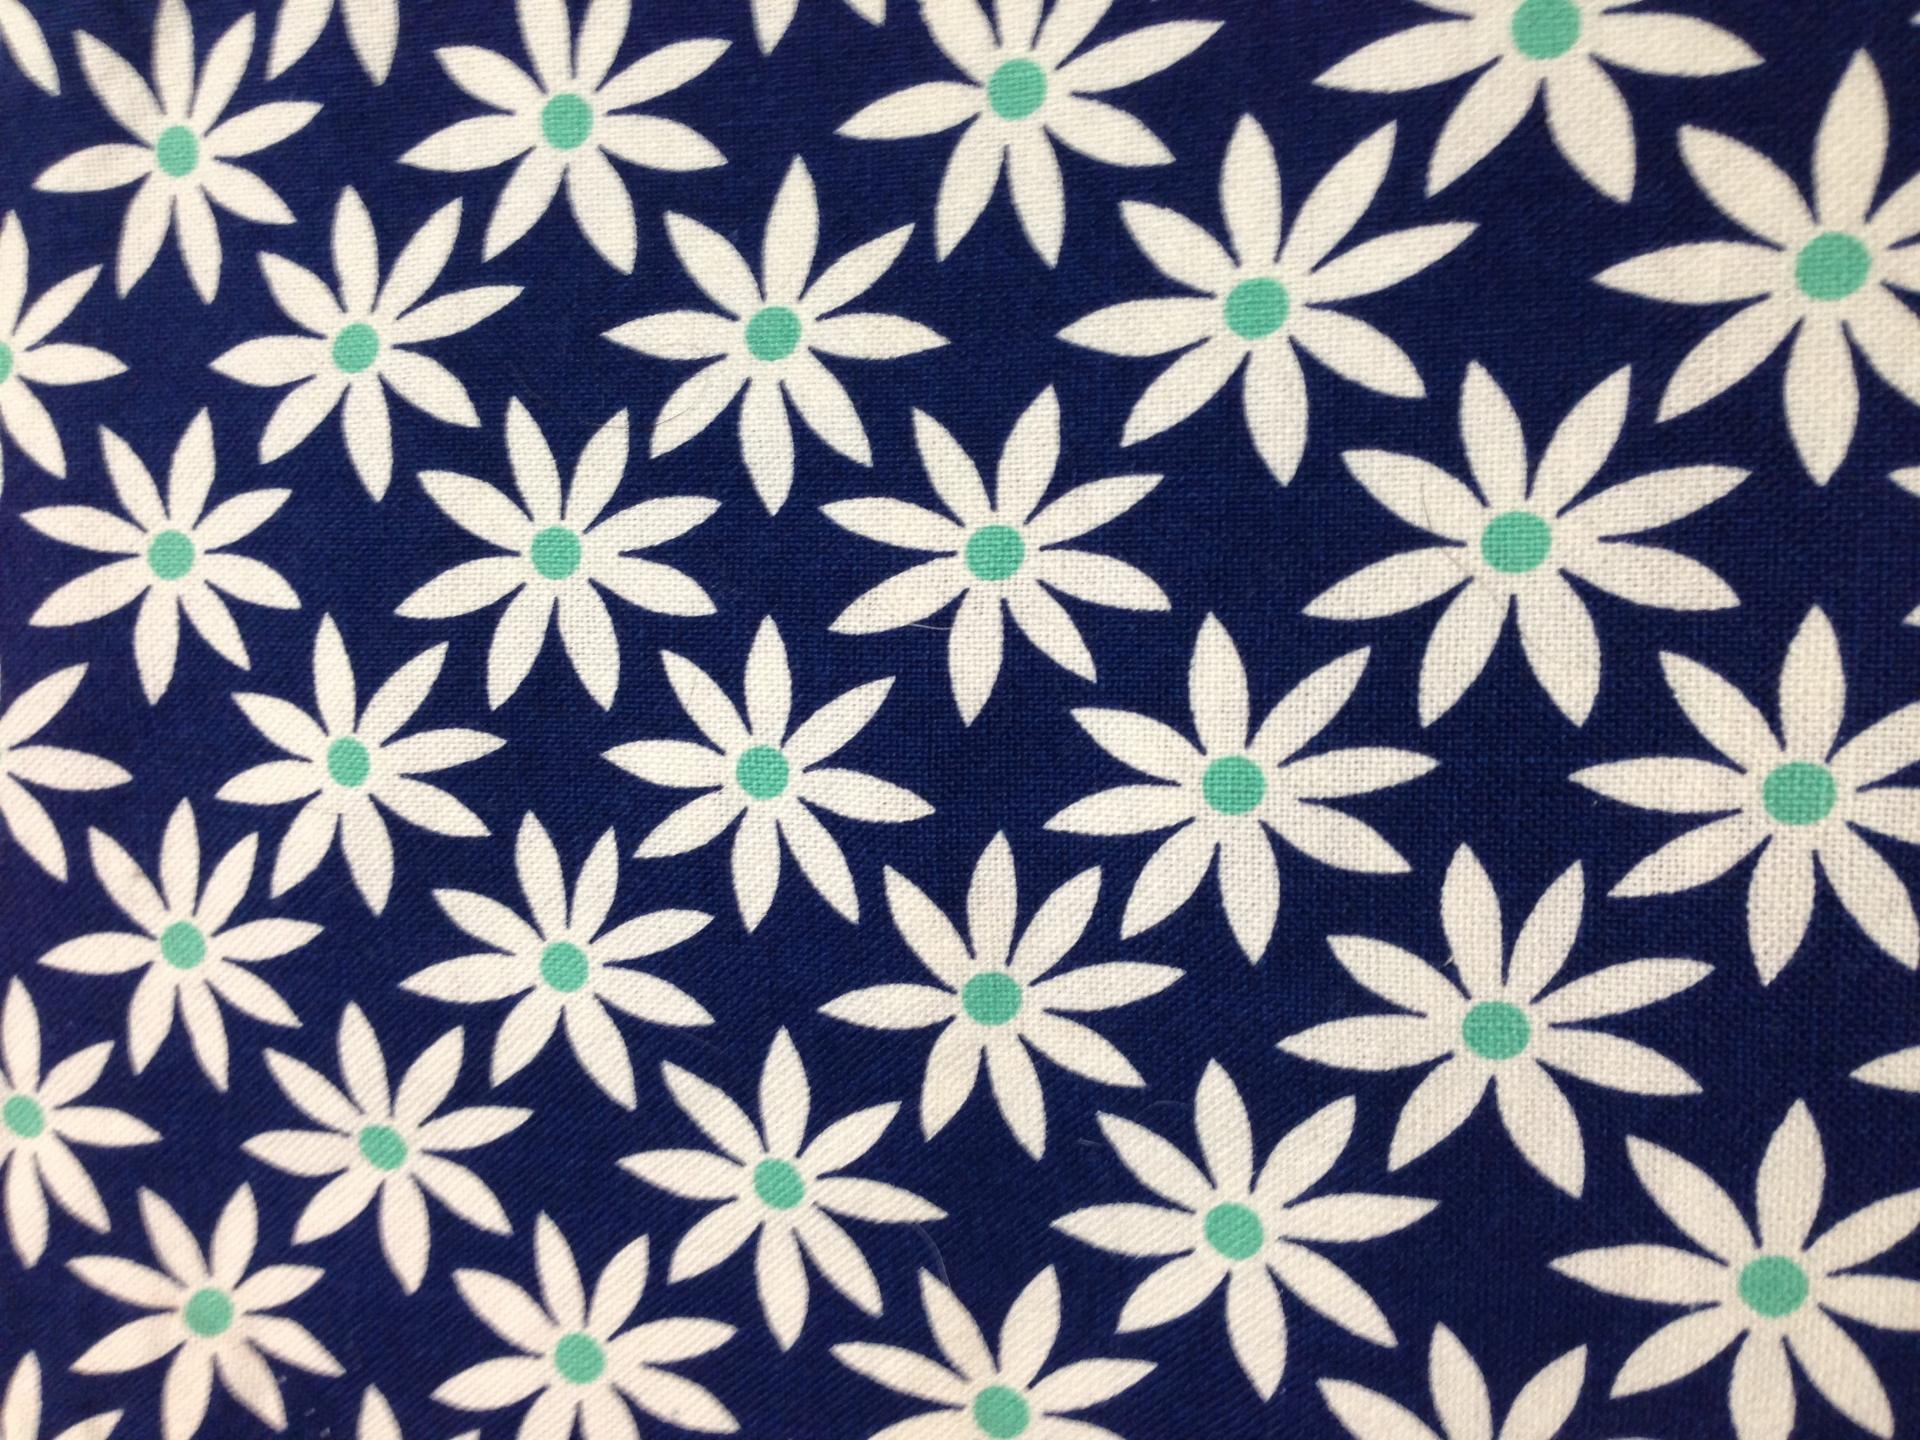 Floral Background Pattern Design Illustration Free Image From